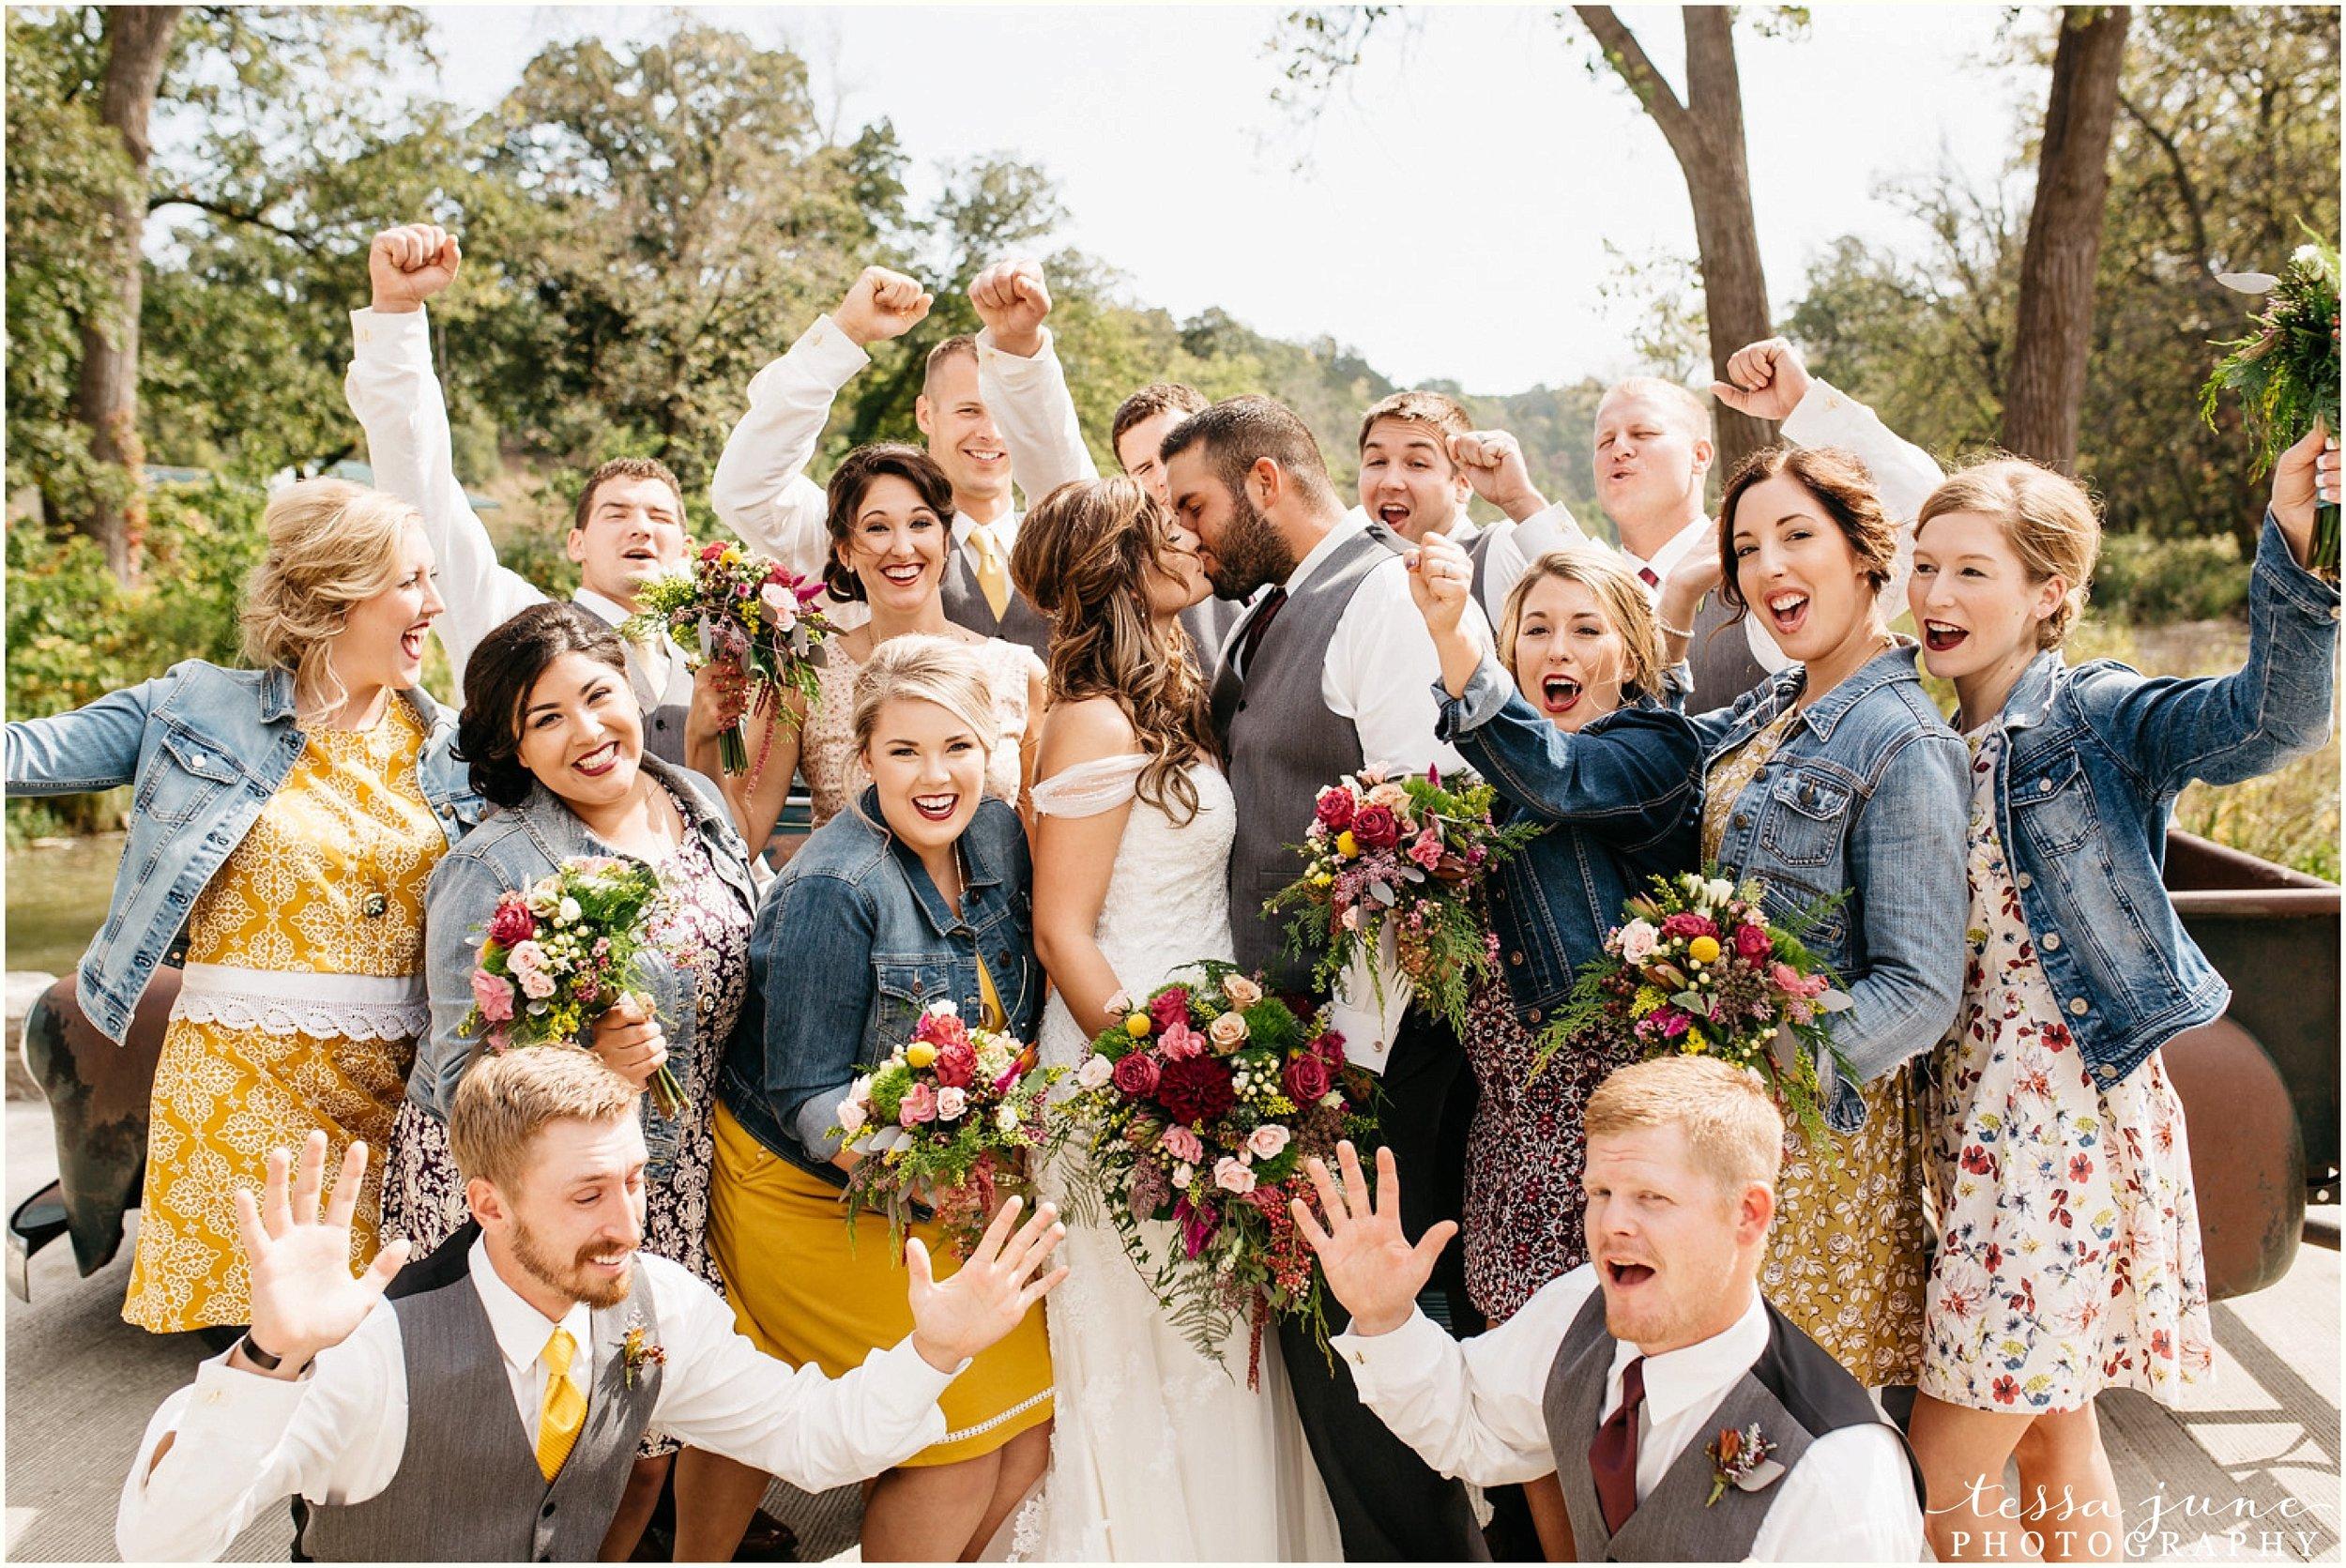 bohemian-minnesota-wedding-mismatched-bridesmaid-dresses-waterfall-st-cloud-tessa-june-photography-71.jpg